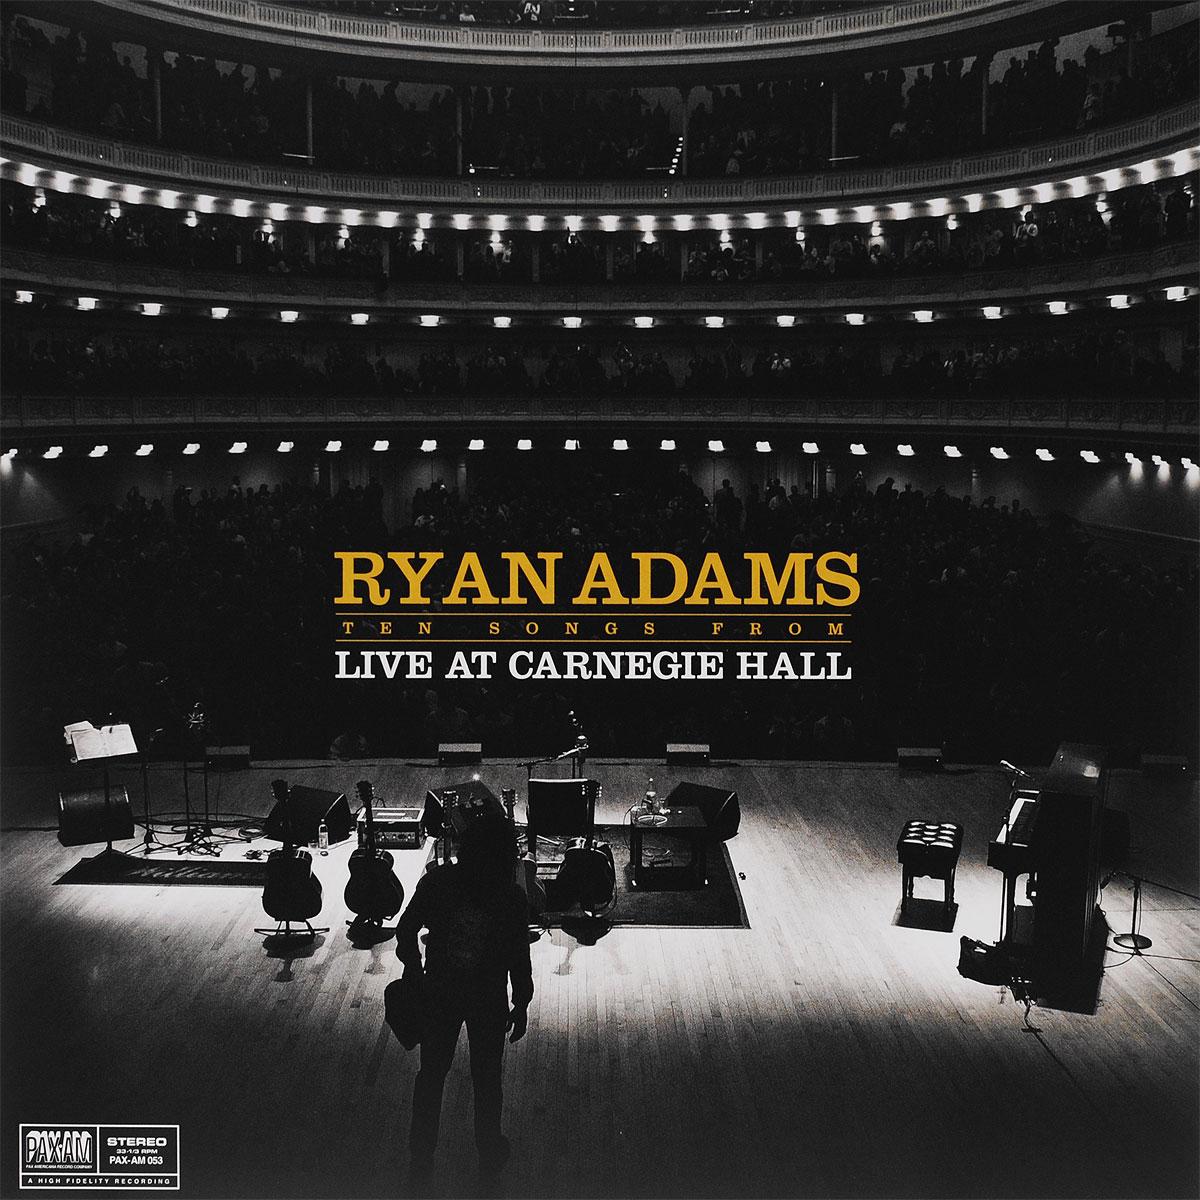 Райан Адамс Ryan Adams. Ten Songs From Live At Carnegie Hall (LP) райан адамс ryan adams 1989